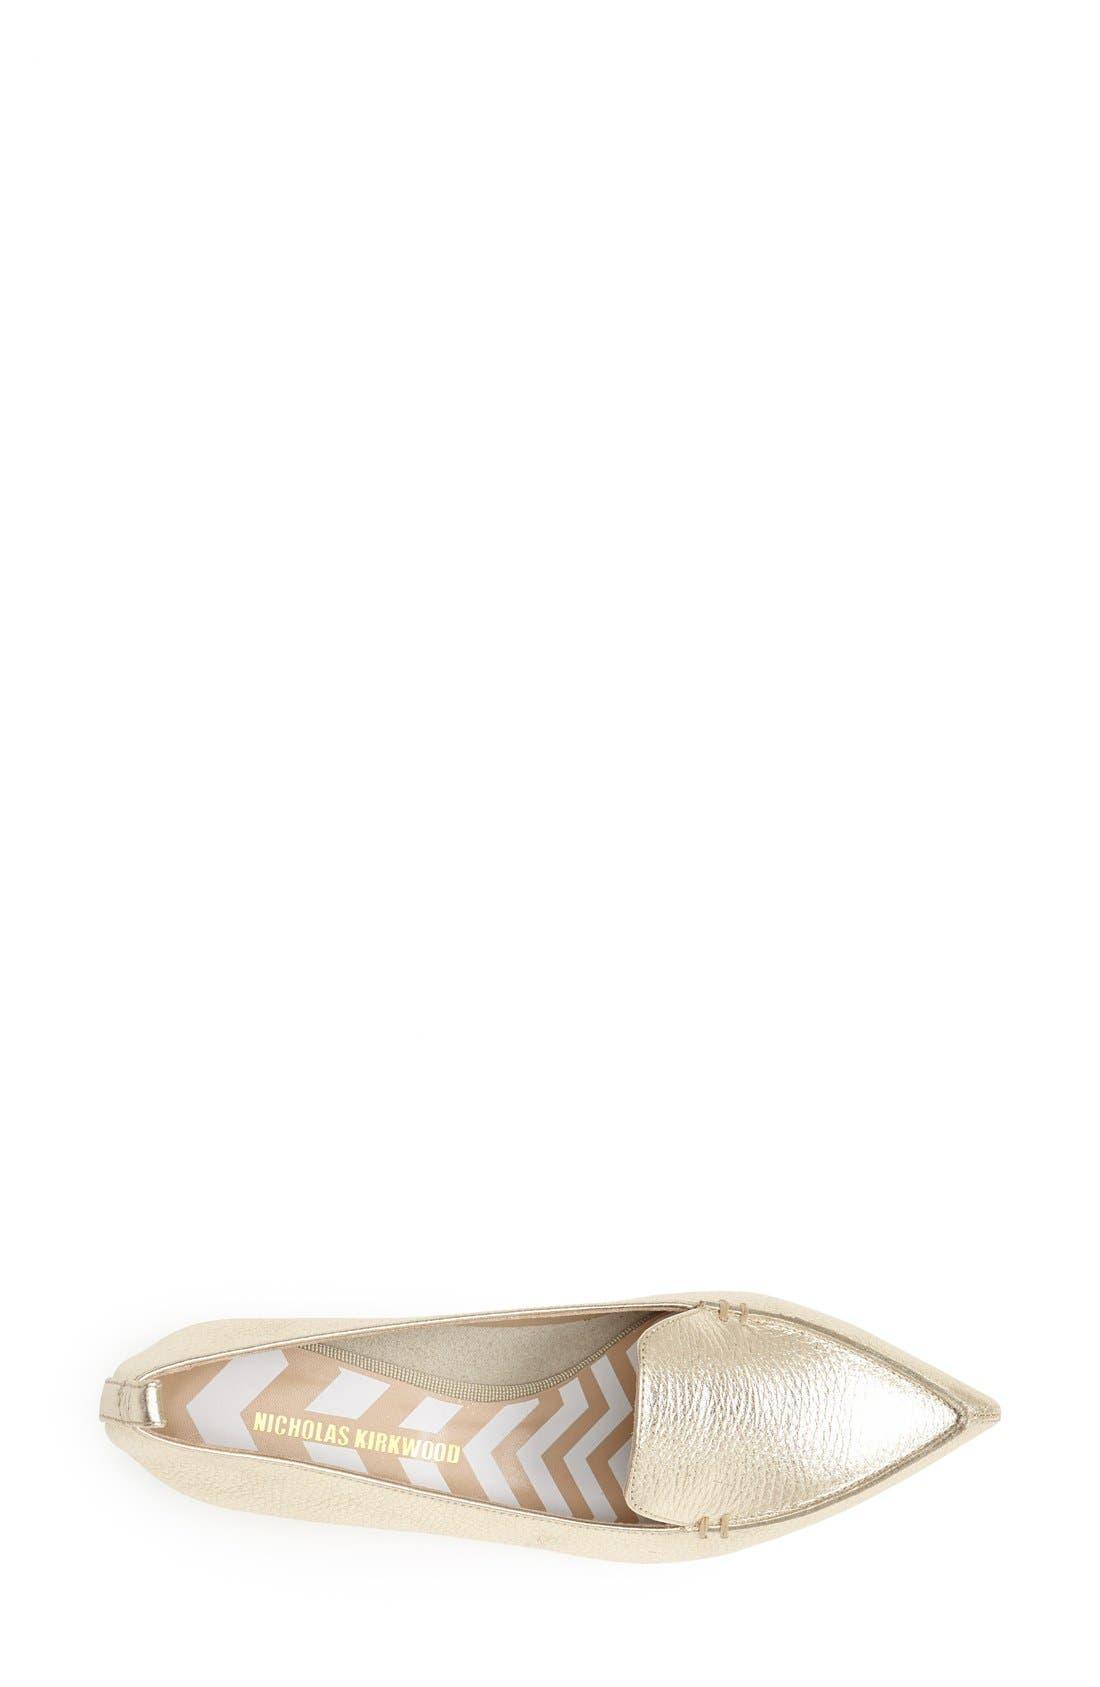 Alternate Image 3  - Nicholas Kirkwood Pointed Toe Loafer (Women)